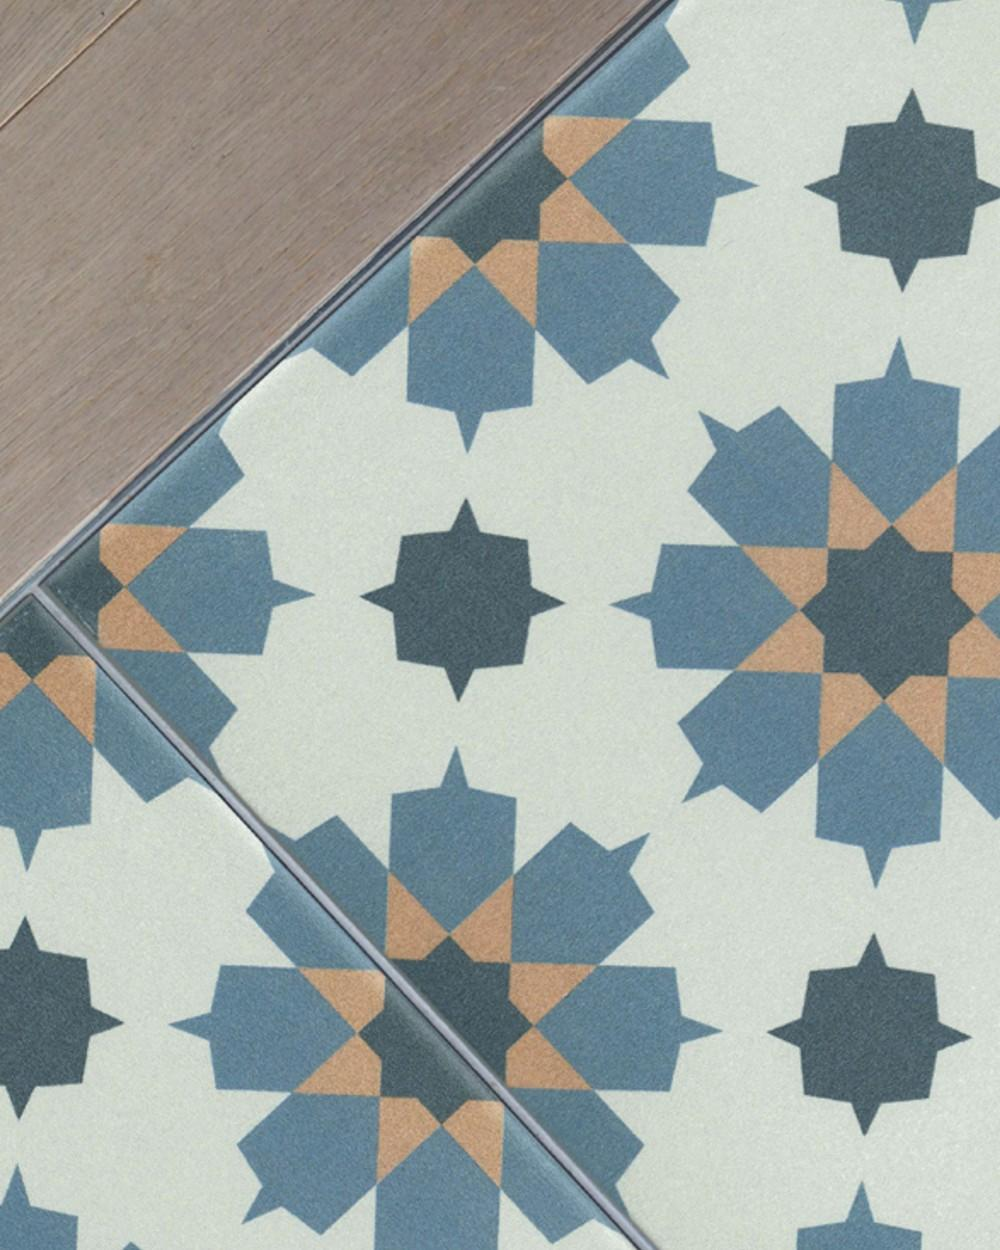 la villete benoit jaune 20x20 cm floor tile r10 keramics tiles online shop